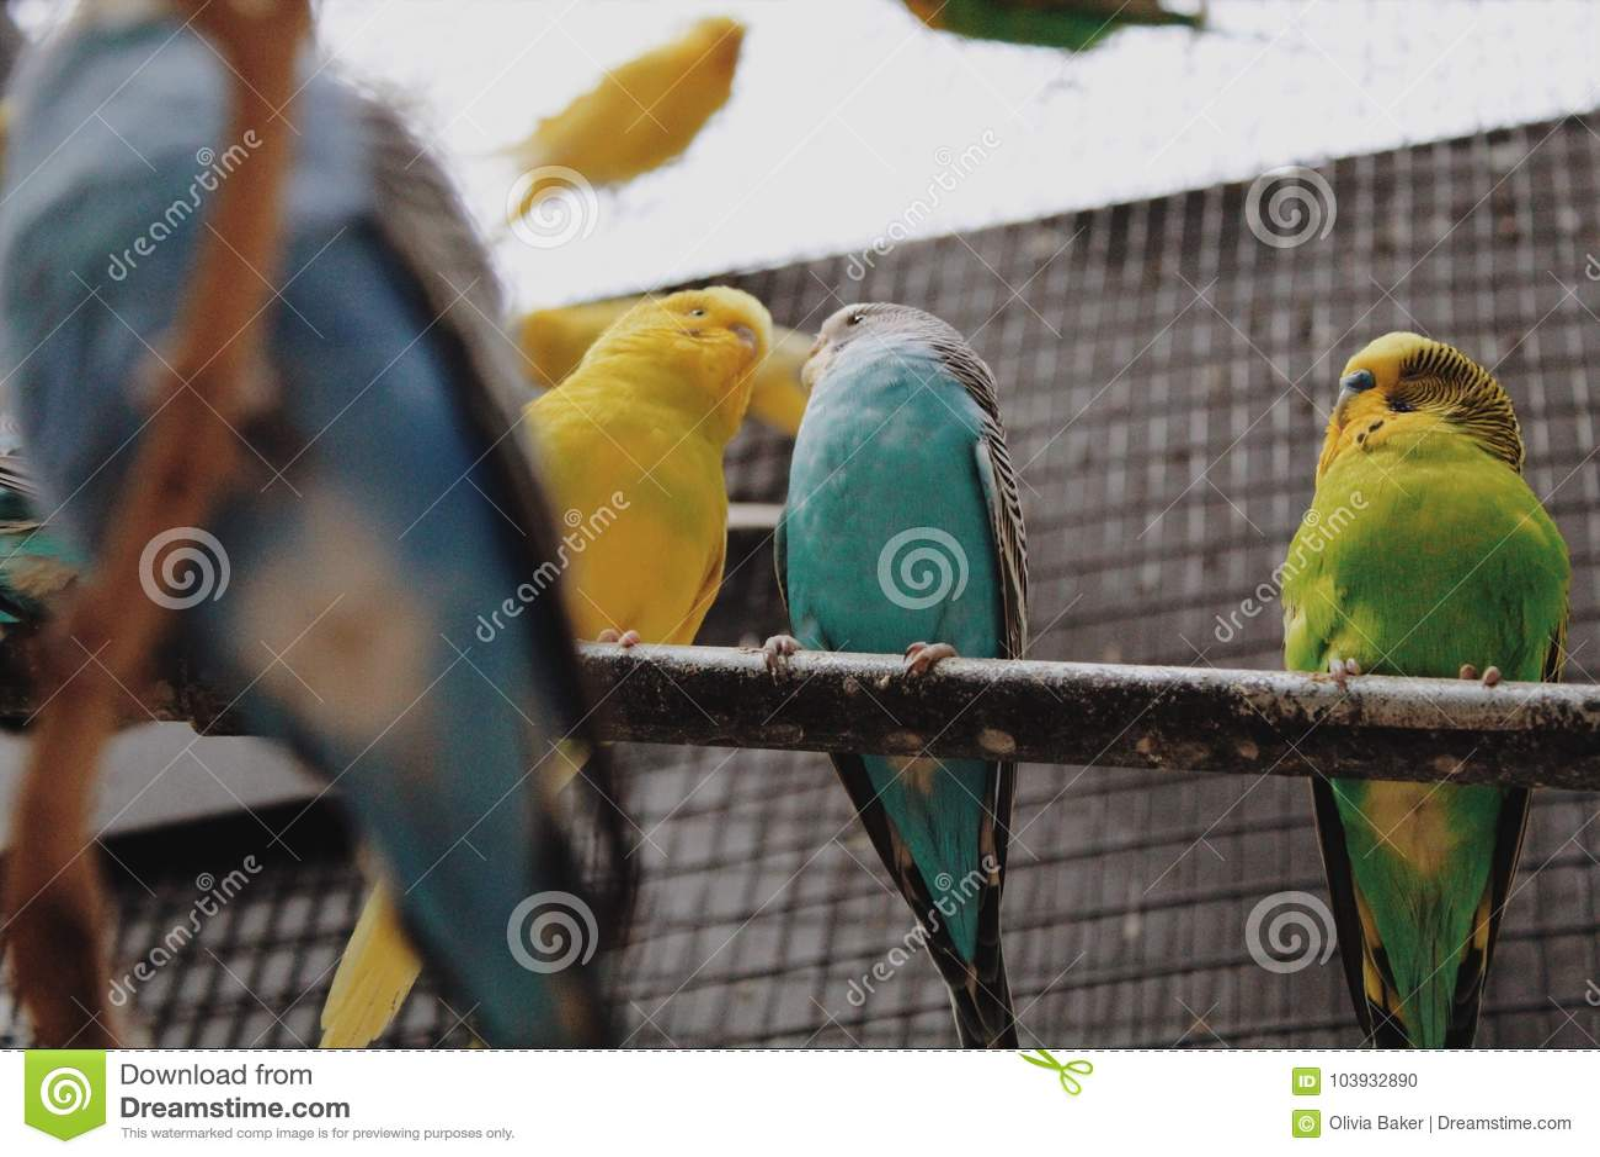 love birds stock photo. image of wallpapers, scene, backgrounds